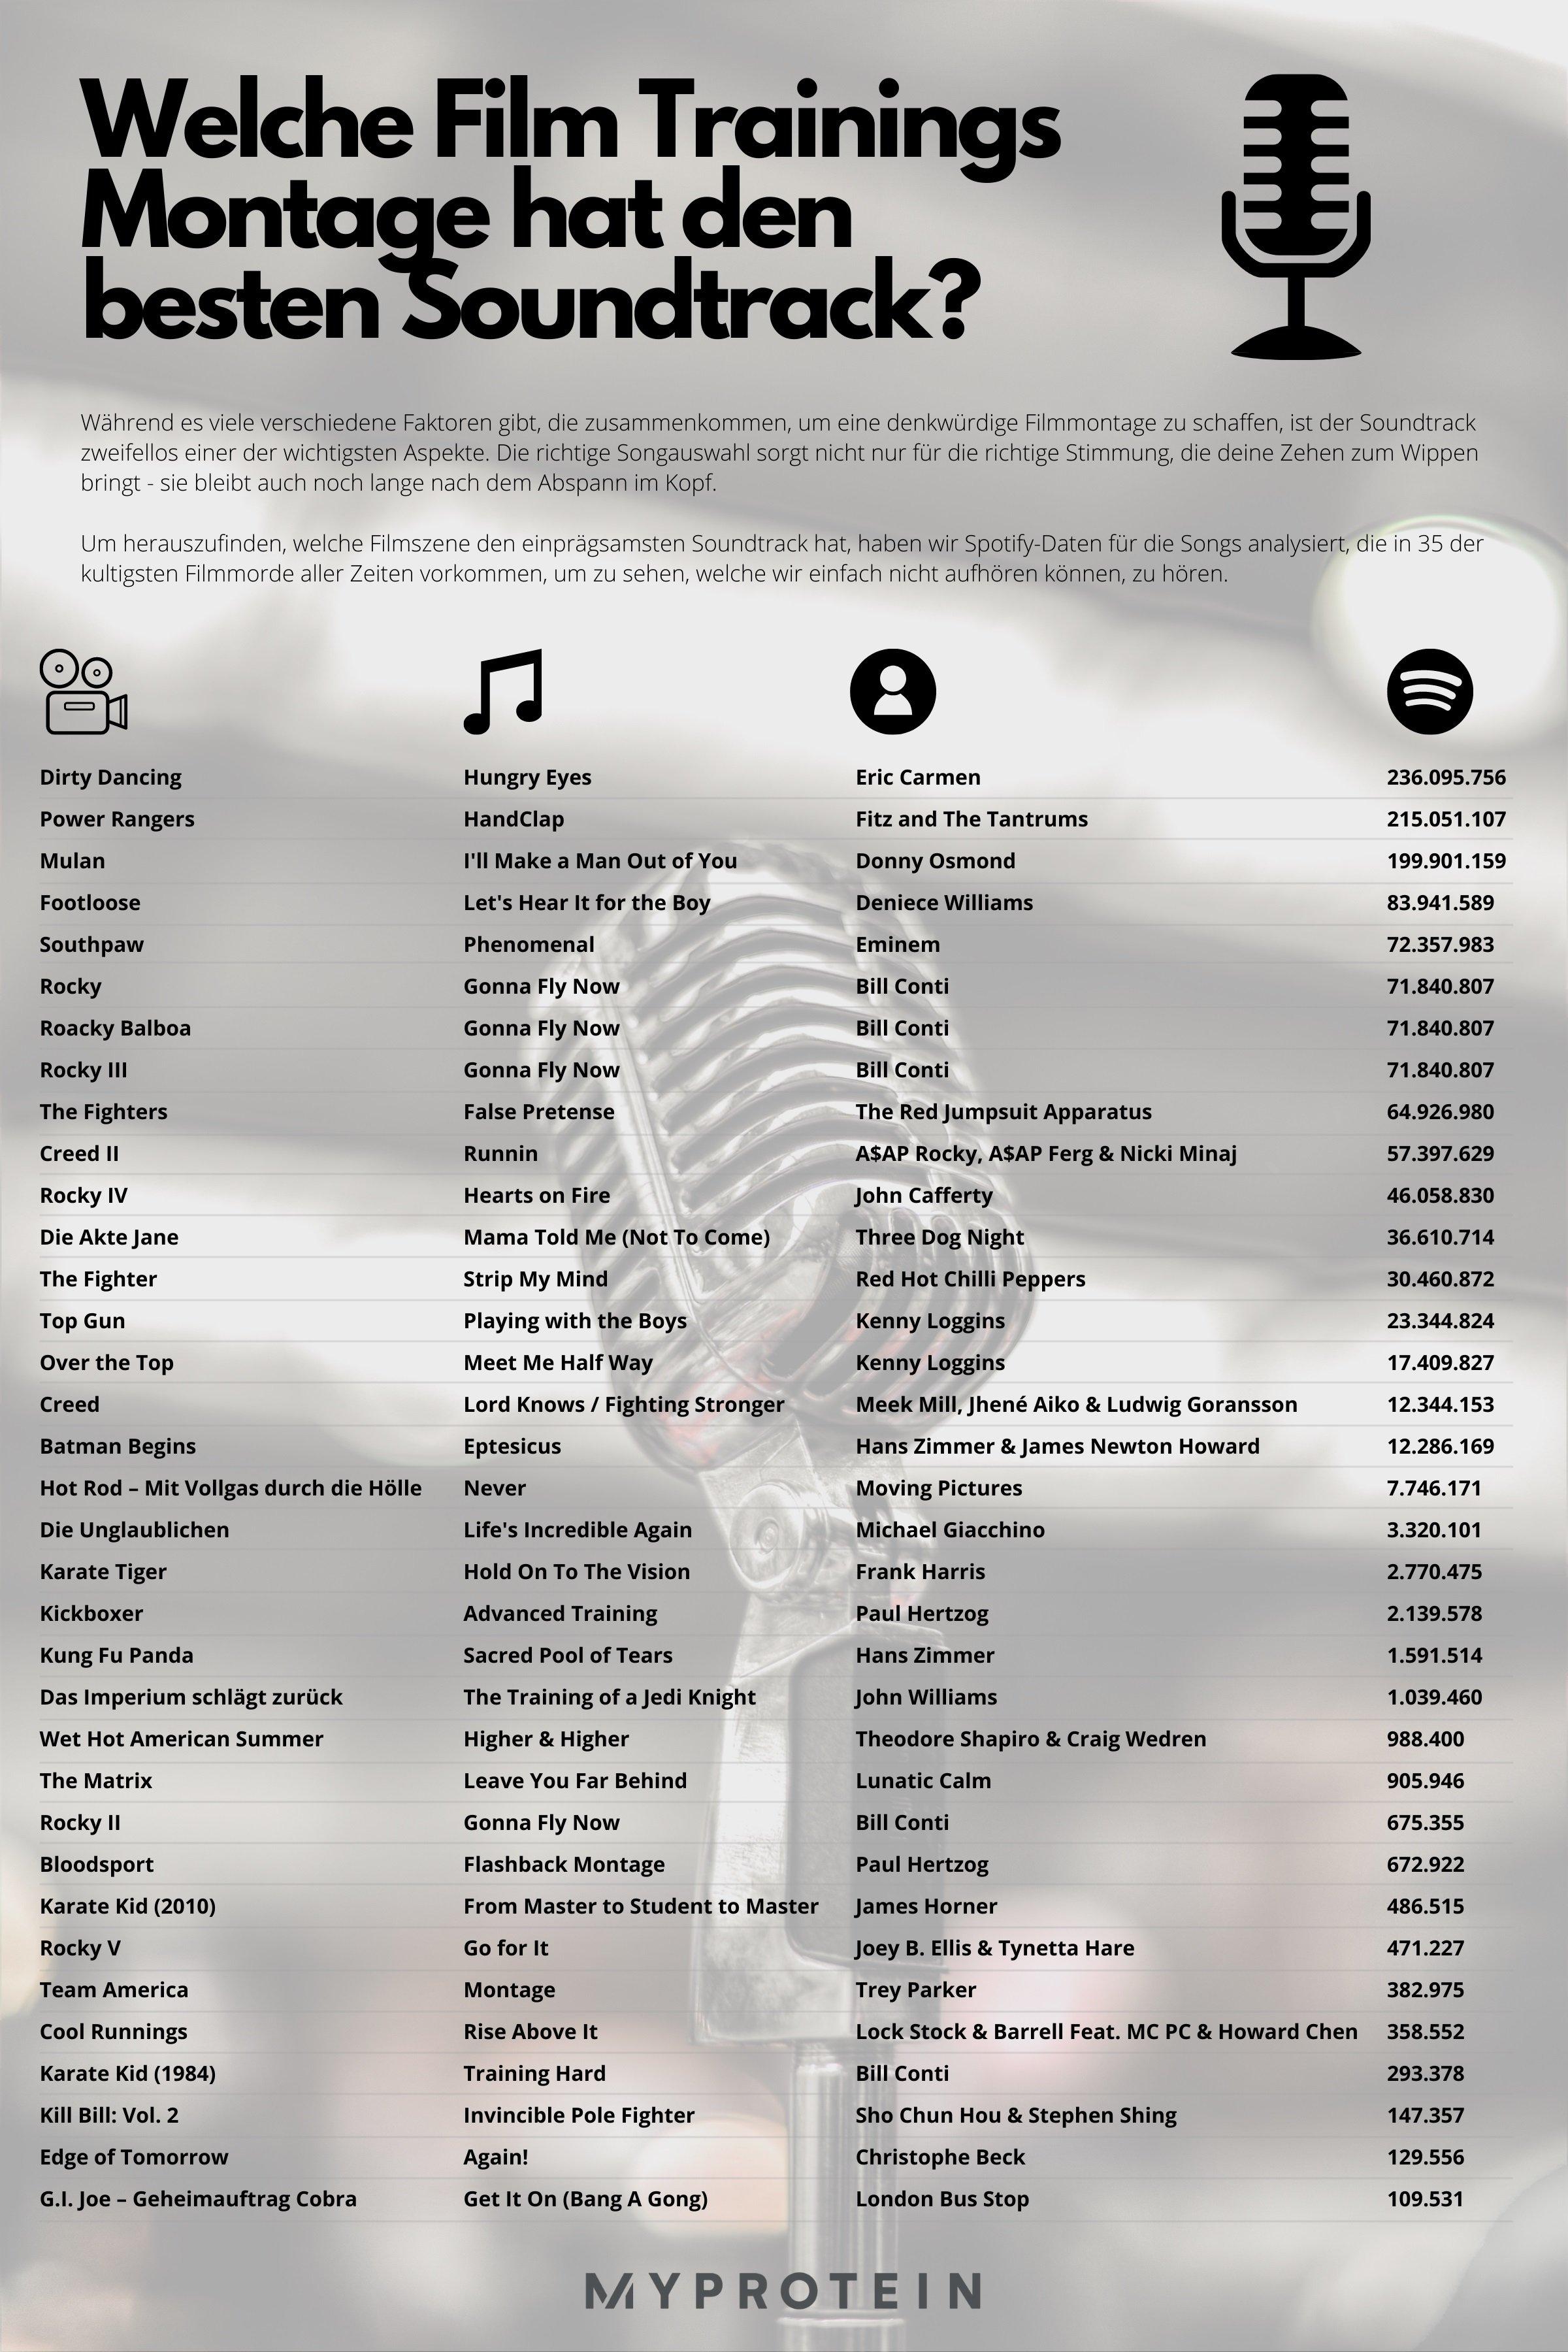 Ultimative Film Training Soundtrack Infografik